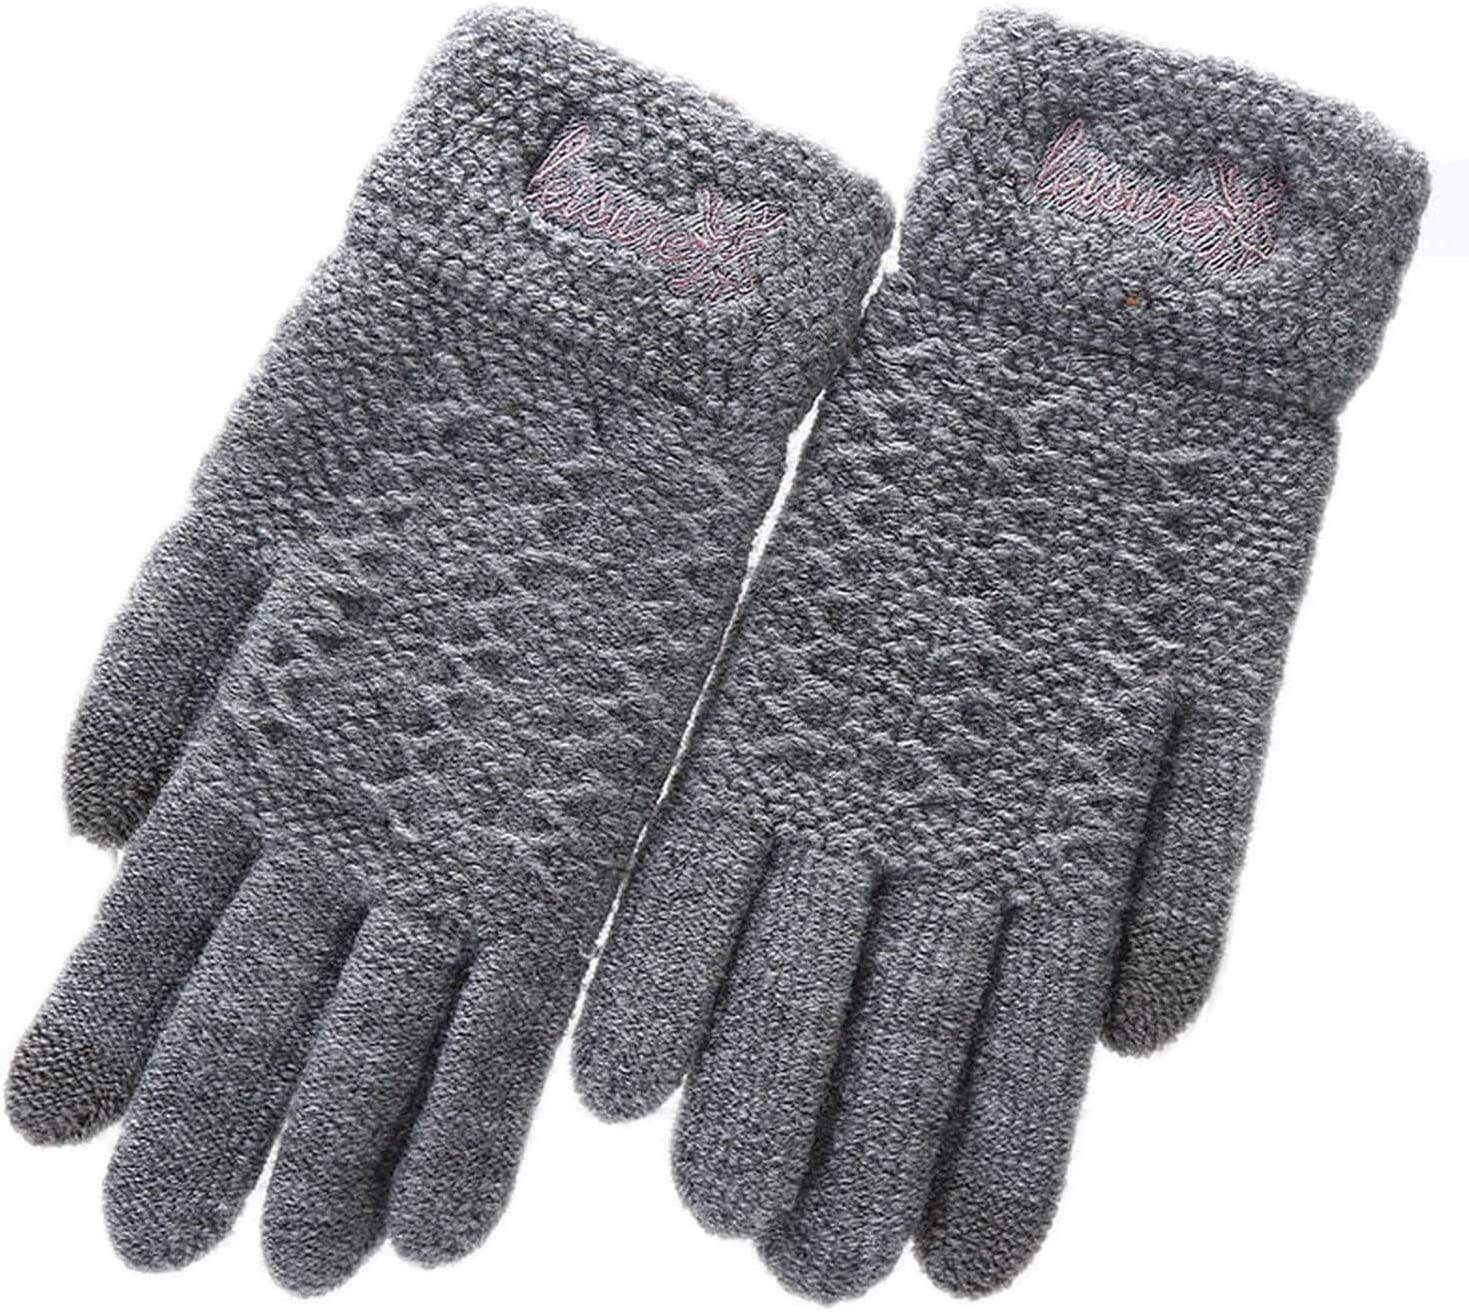 Samantha Warm Gloves Ladies Winter Warm Cute Cartoon Finger Knit Touch Screen Gloves Women Full Finger Soft Mittens Black Gloves (Color : E Gray, Size : Oneszie)